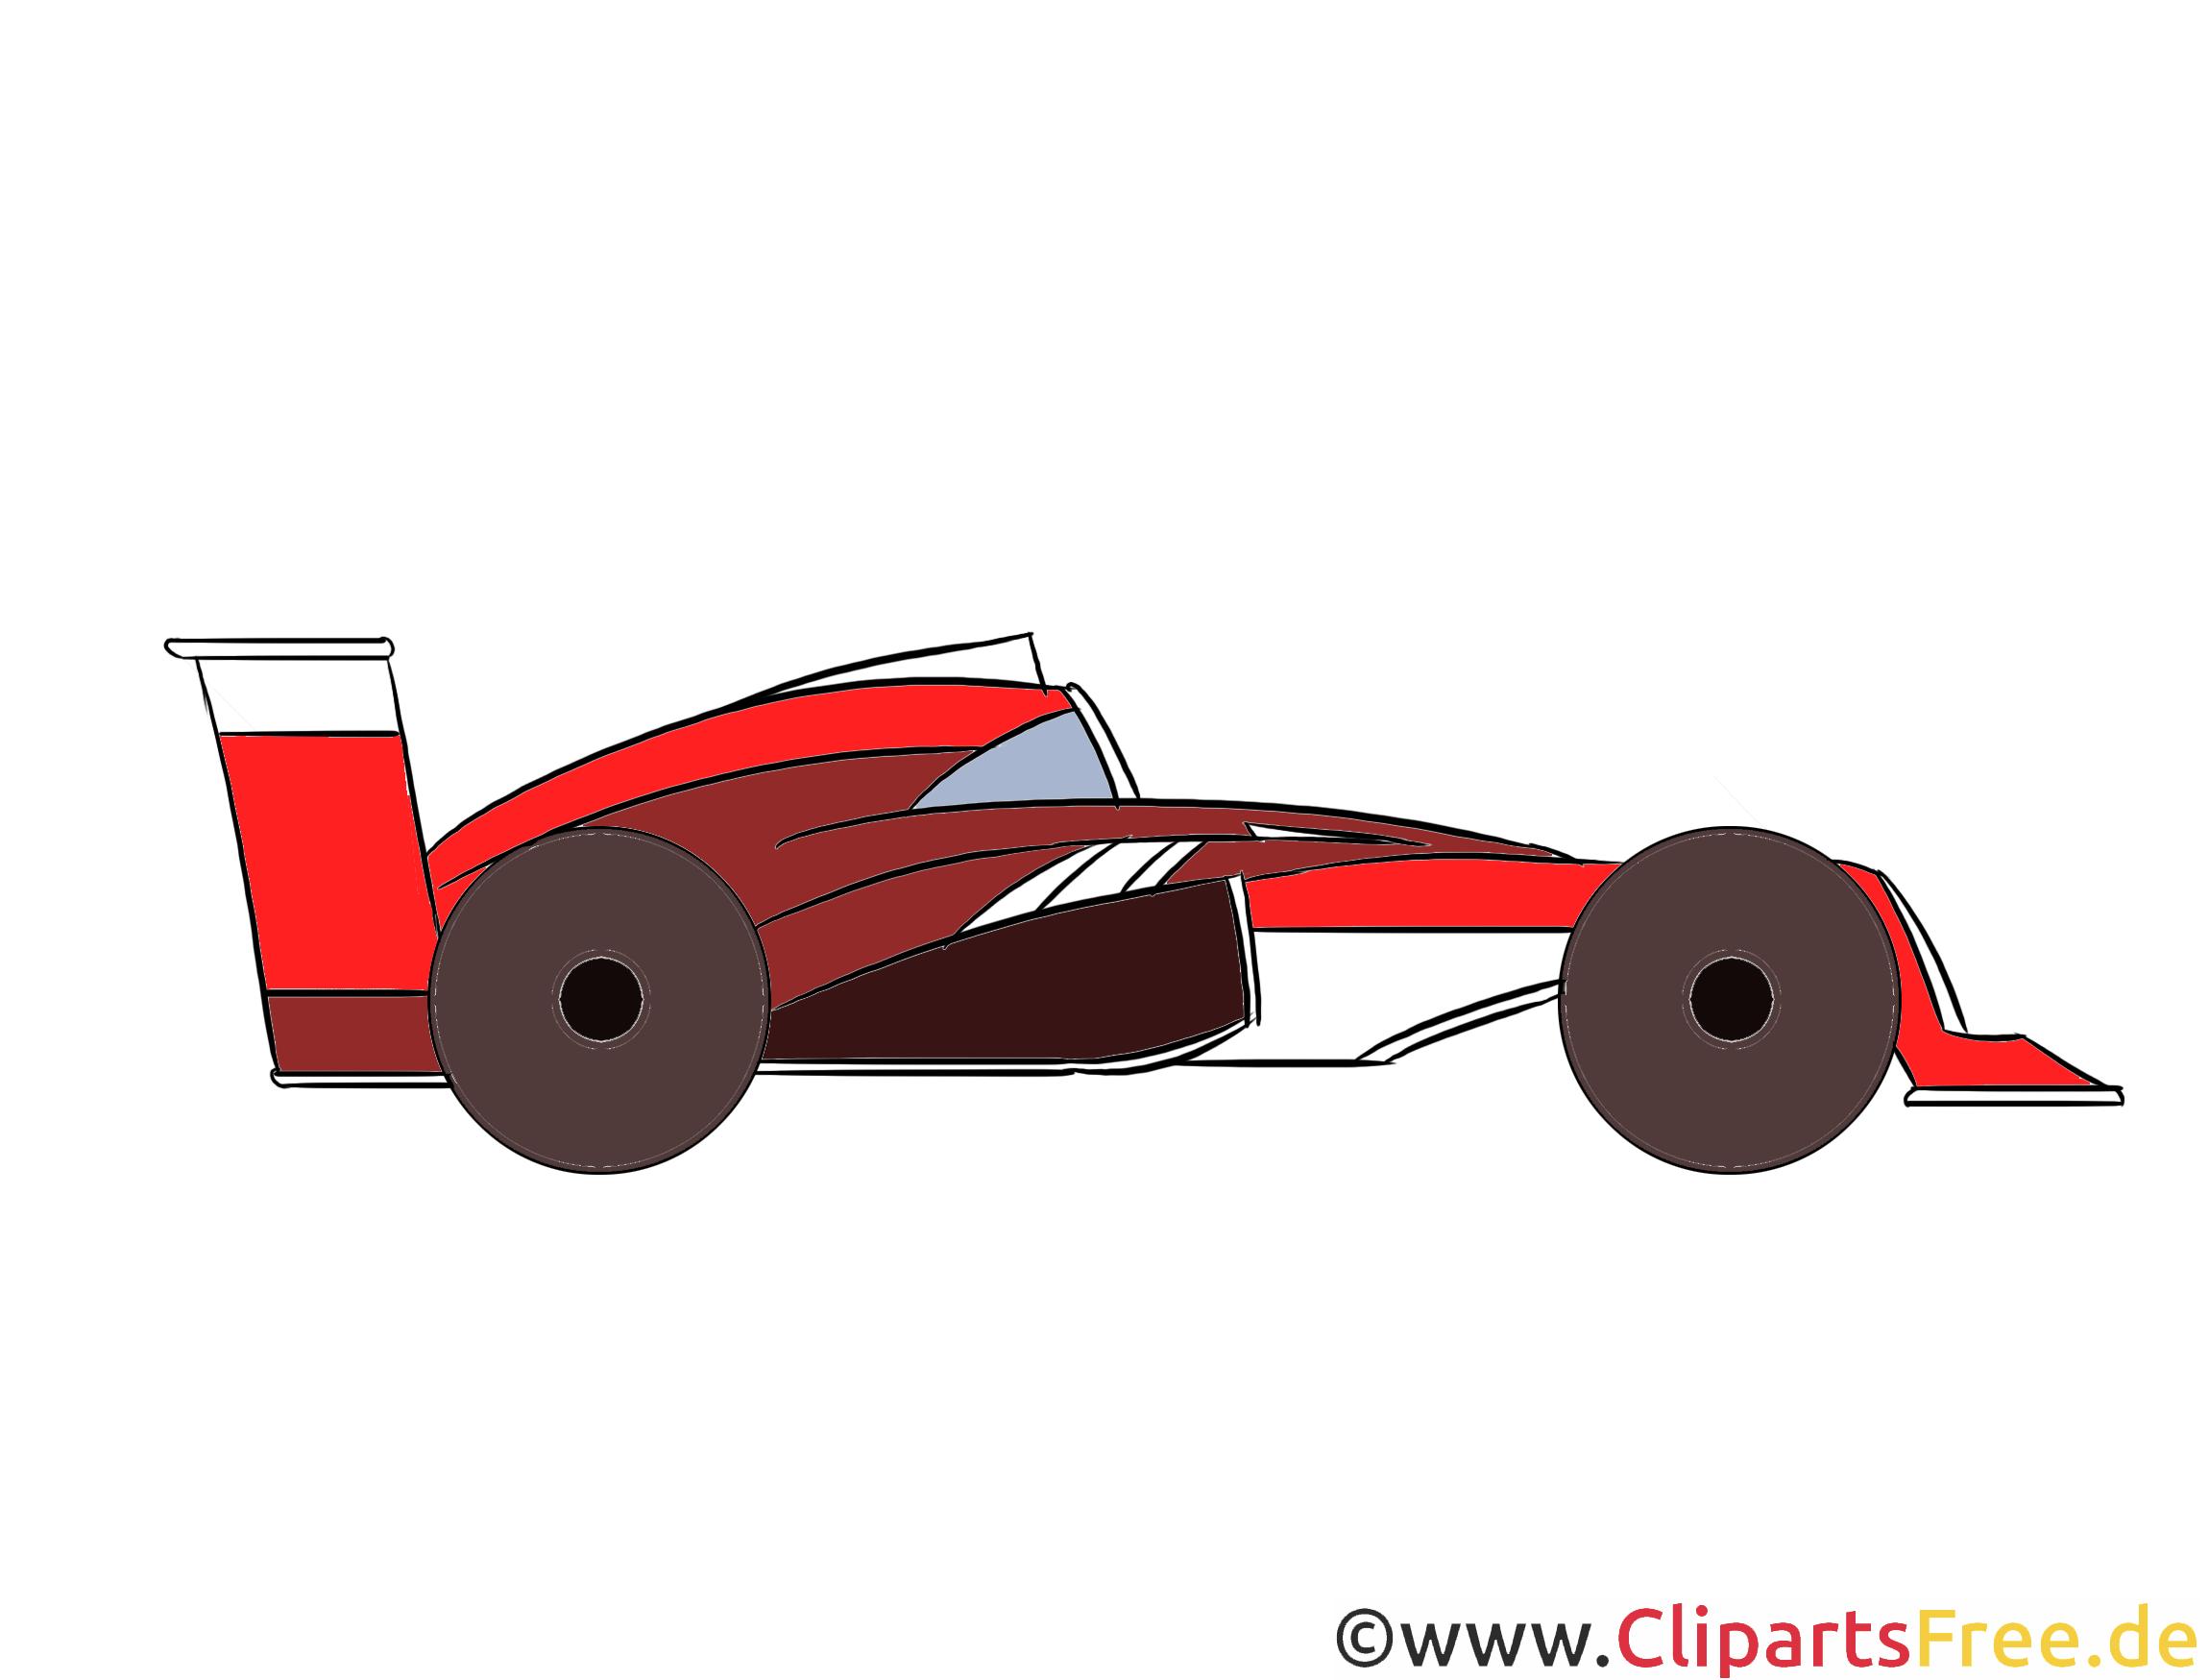 Formel 1 Rennwagen Clipart, Illustration, Bild kostenlos